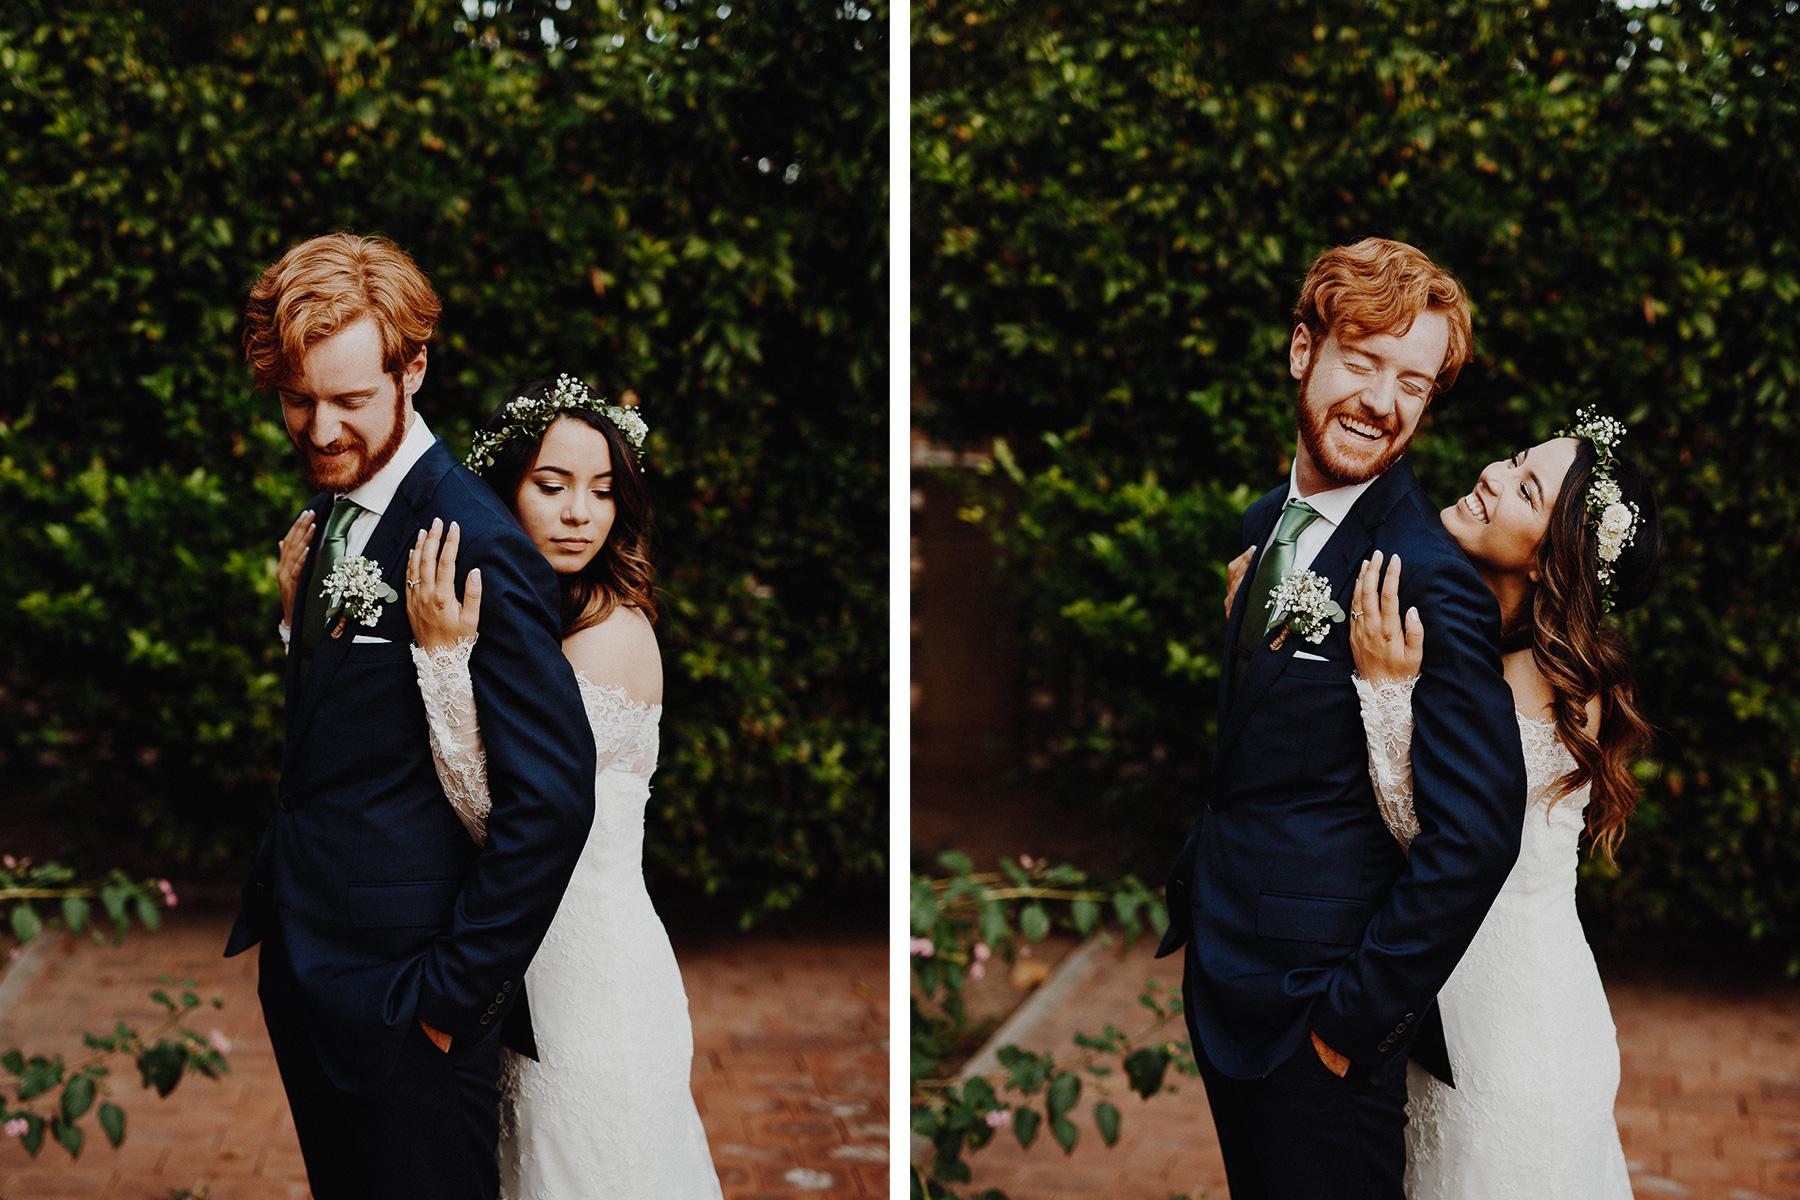 181104-Luxium-Weddings-Arizona-@matt__Le-Brandon-Kariana-Phoenix-Valley-Garden-Center-1105a.jpg